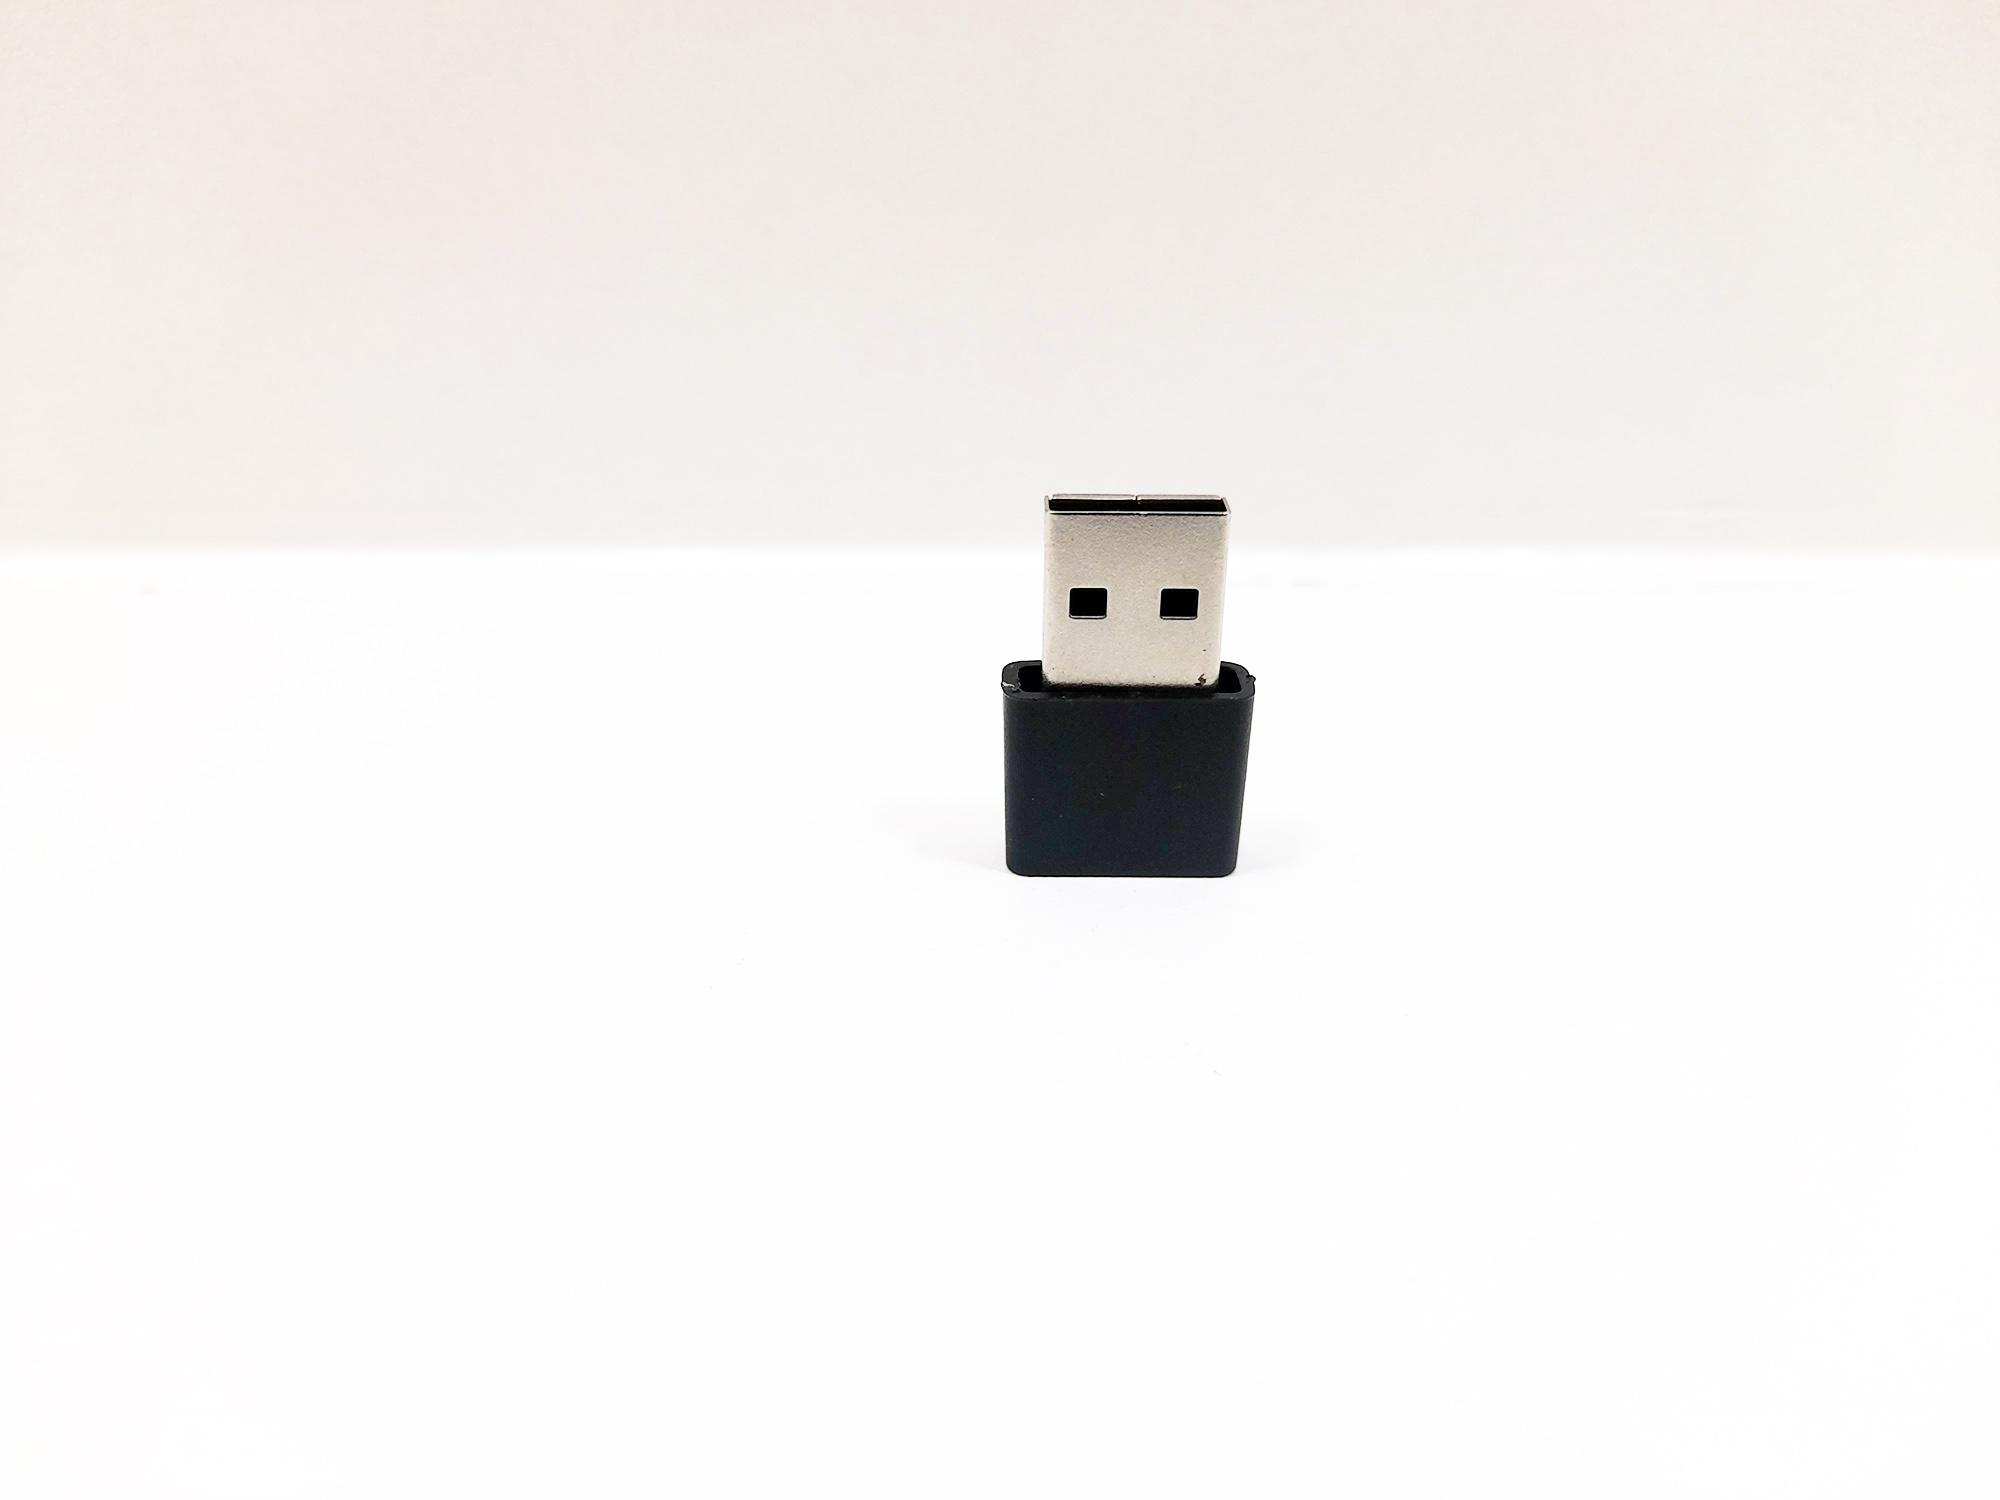 Pen drive Ecológico Fit Start 8 GB e16 GB - Linha rECOdrive